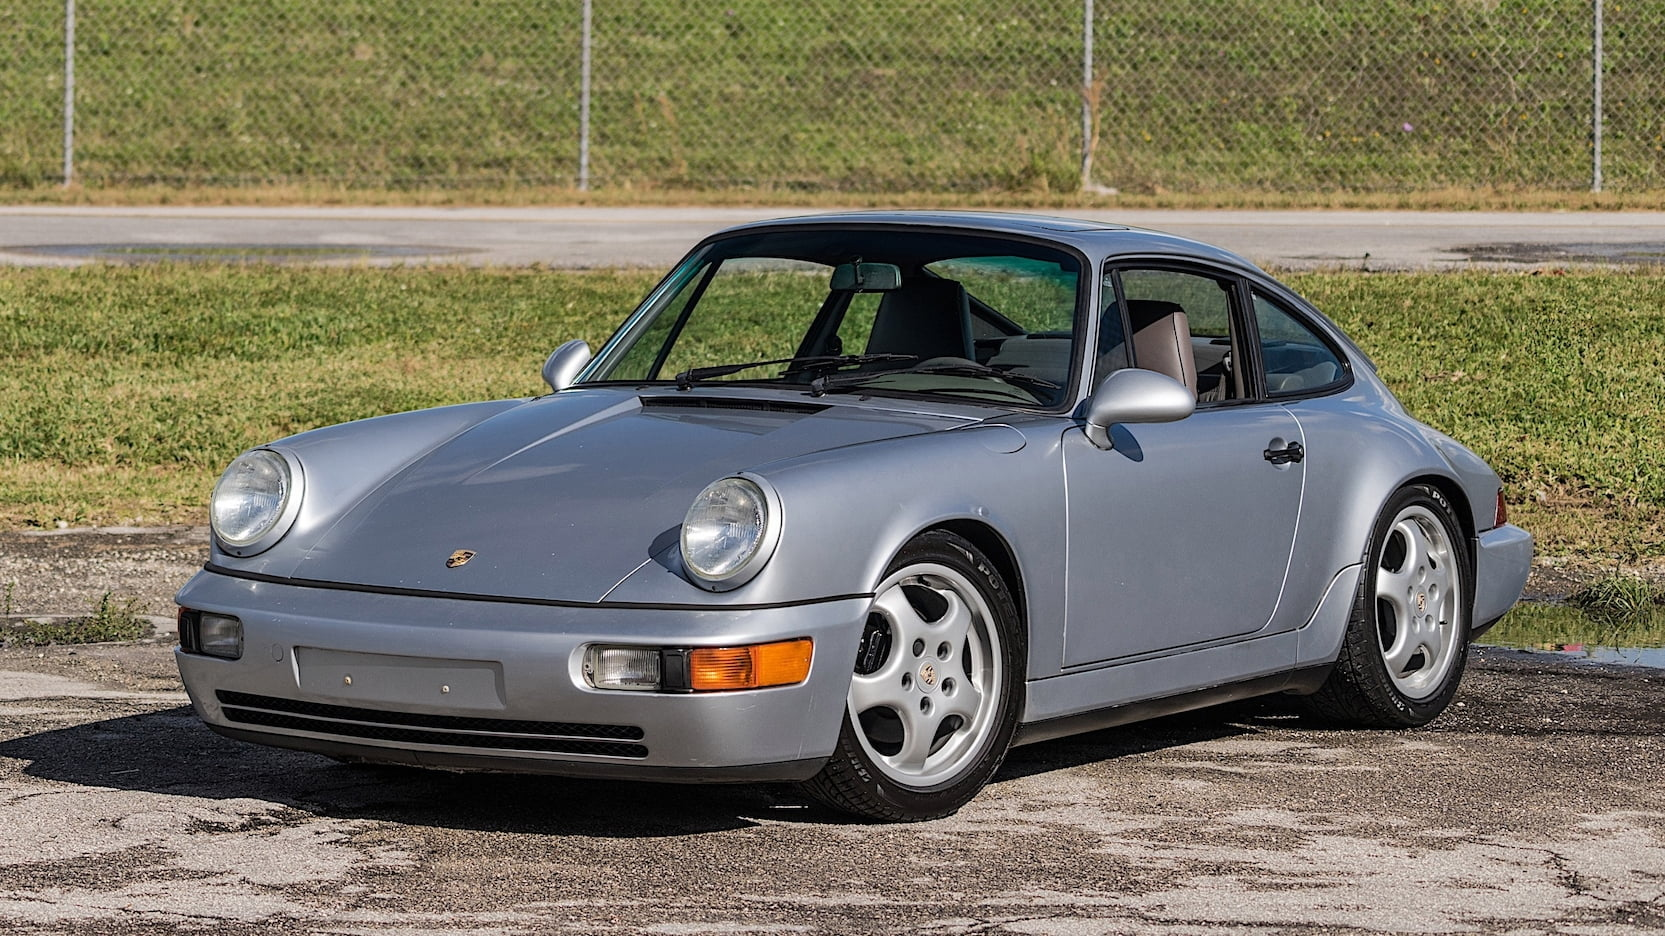 1993 Porsche 911 Carrera 2 Silver 3/4 view